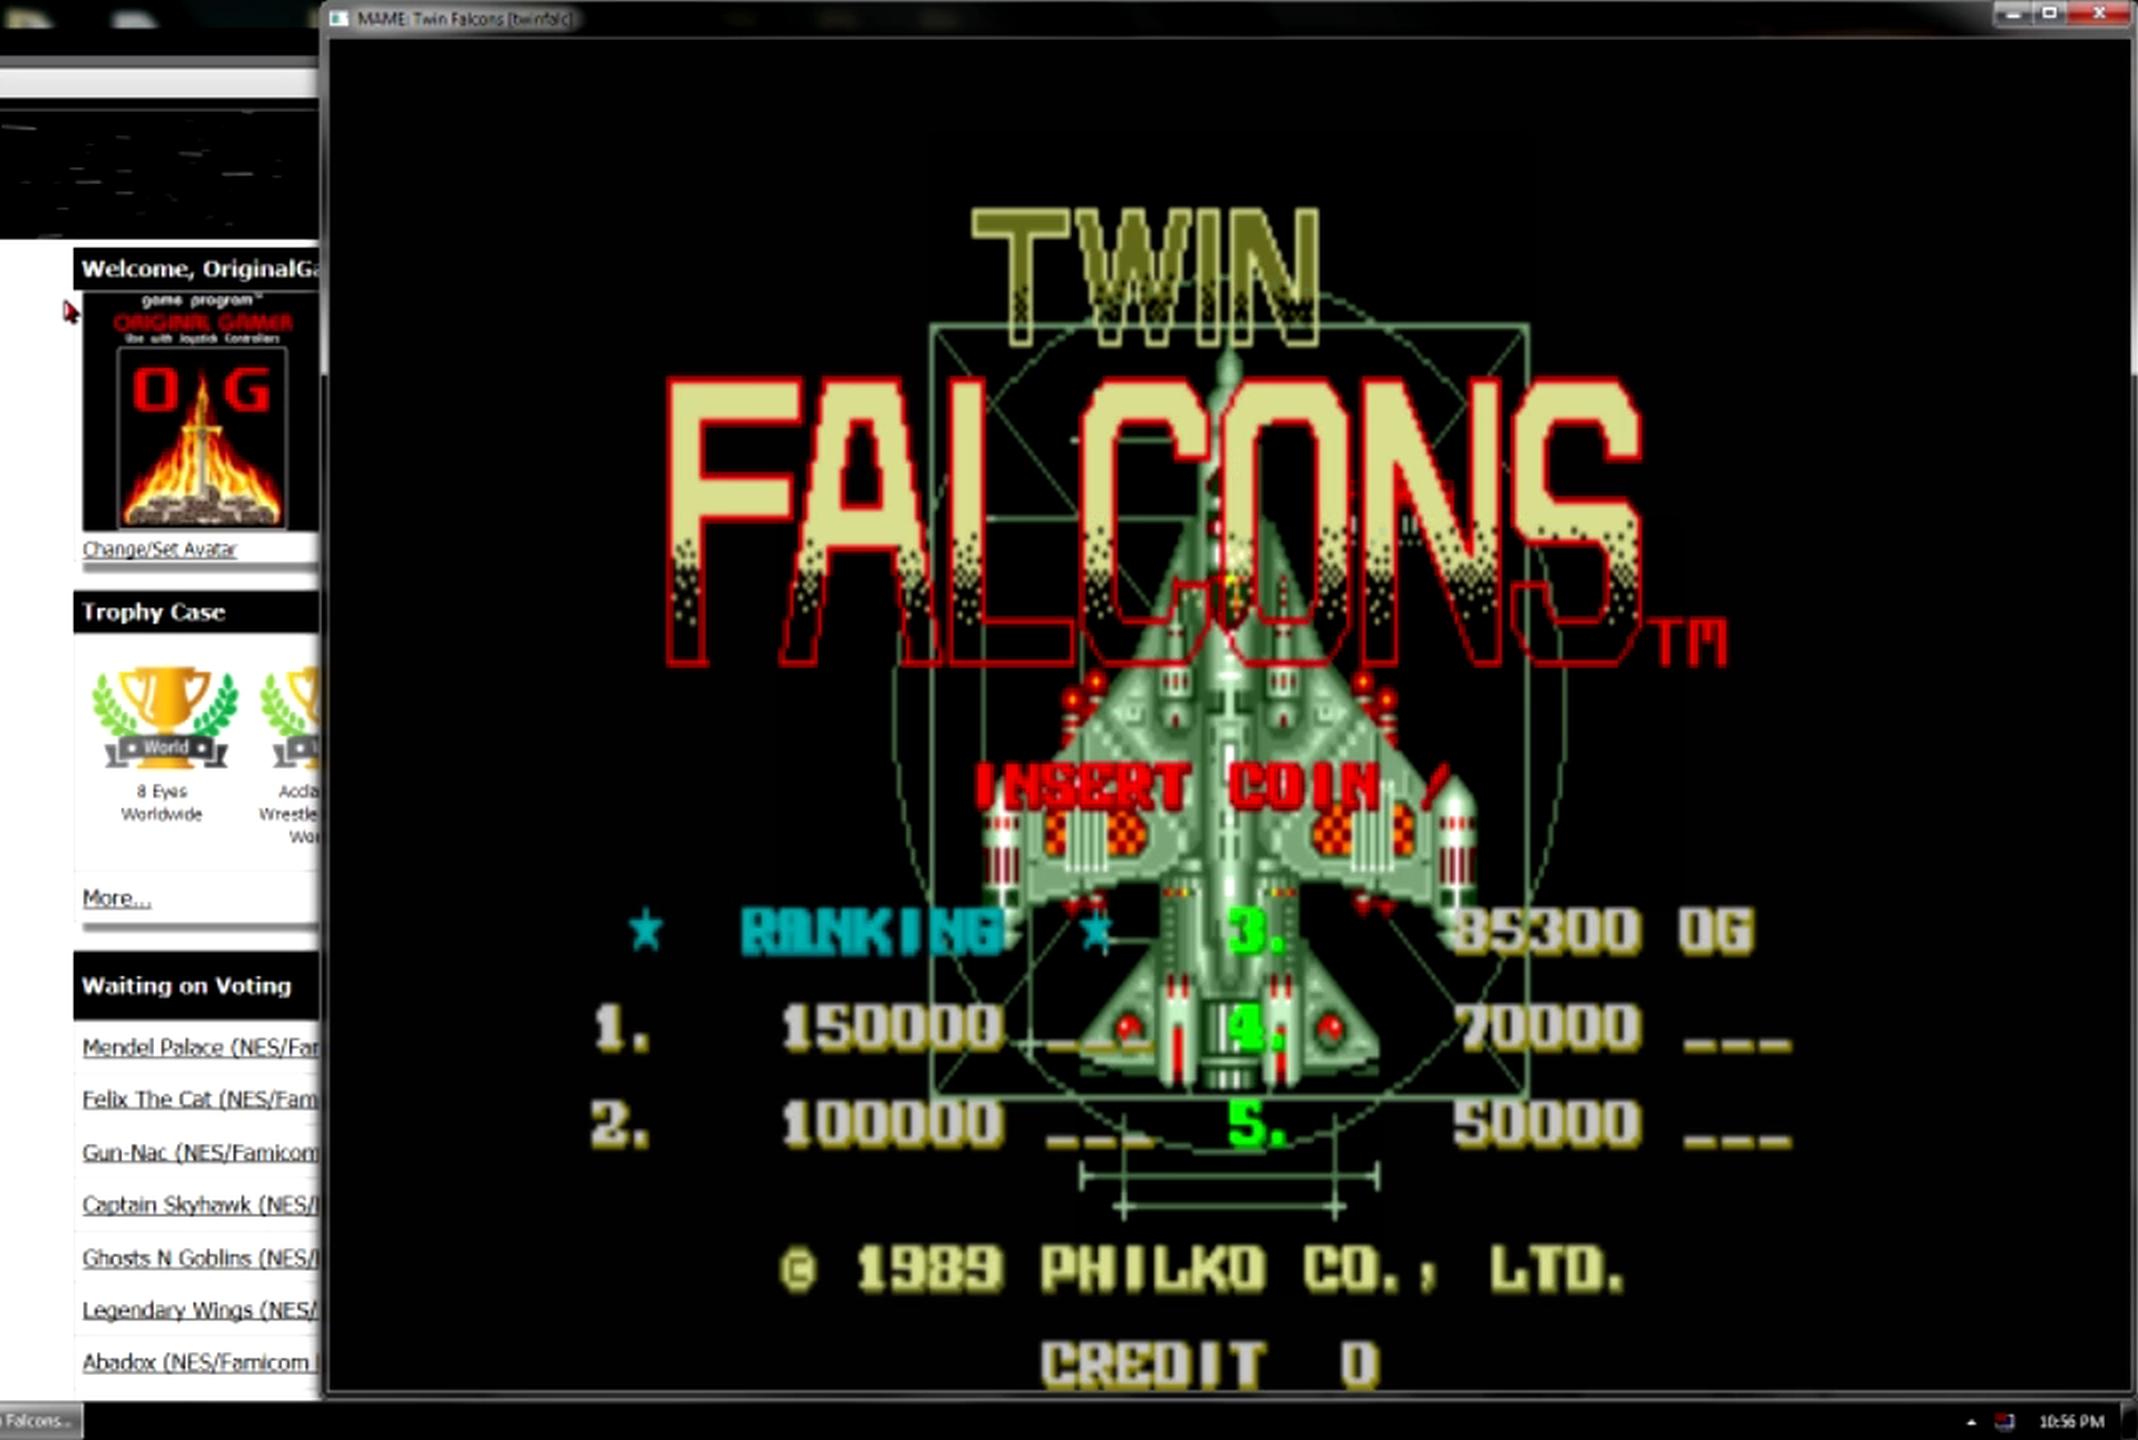 OriginalGamer: Twin Falcons [twinfalc] (Arcade Emulated / M.A.M.E.) 85,300 points on 2015-05-11 13:38:27